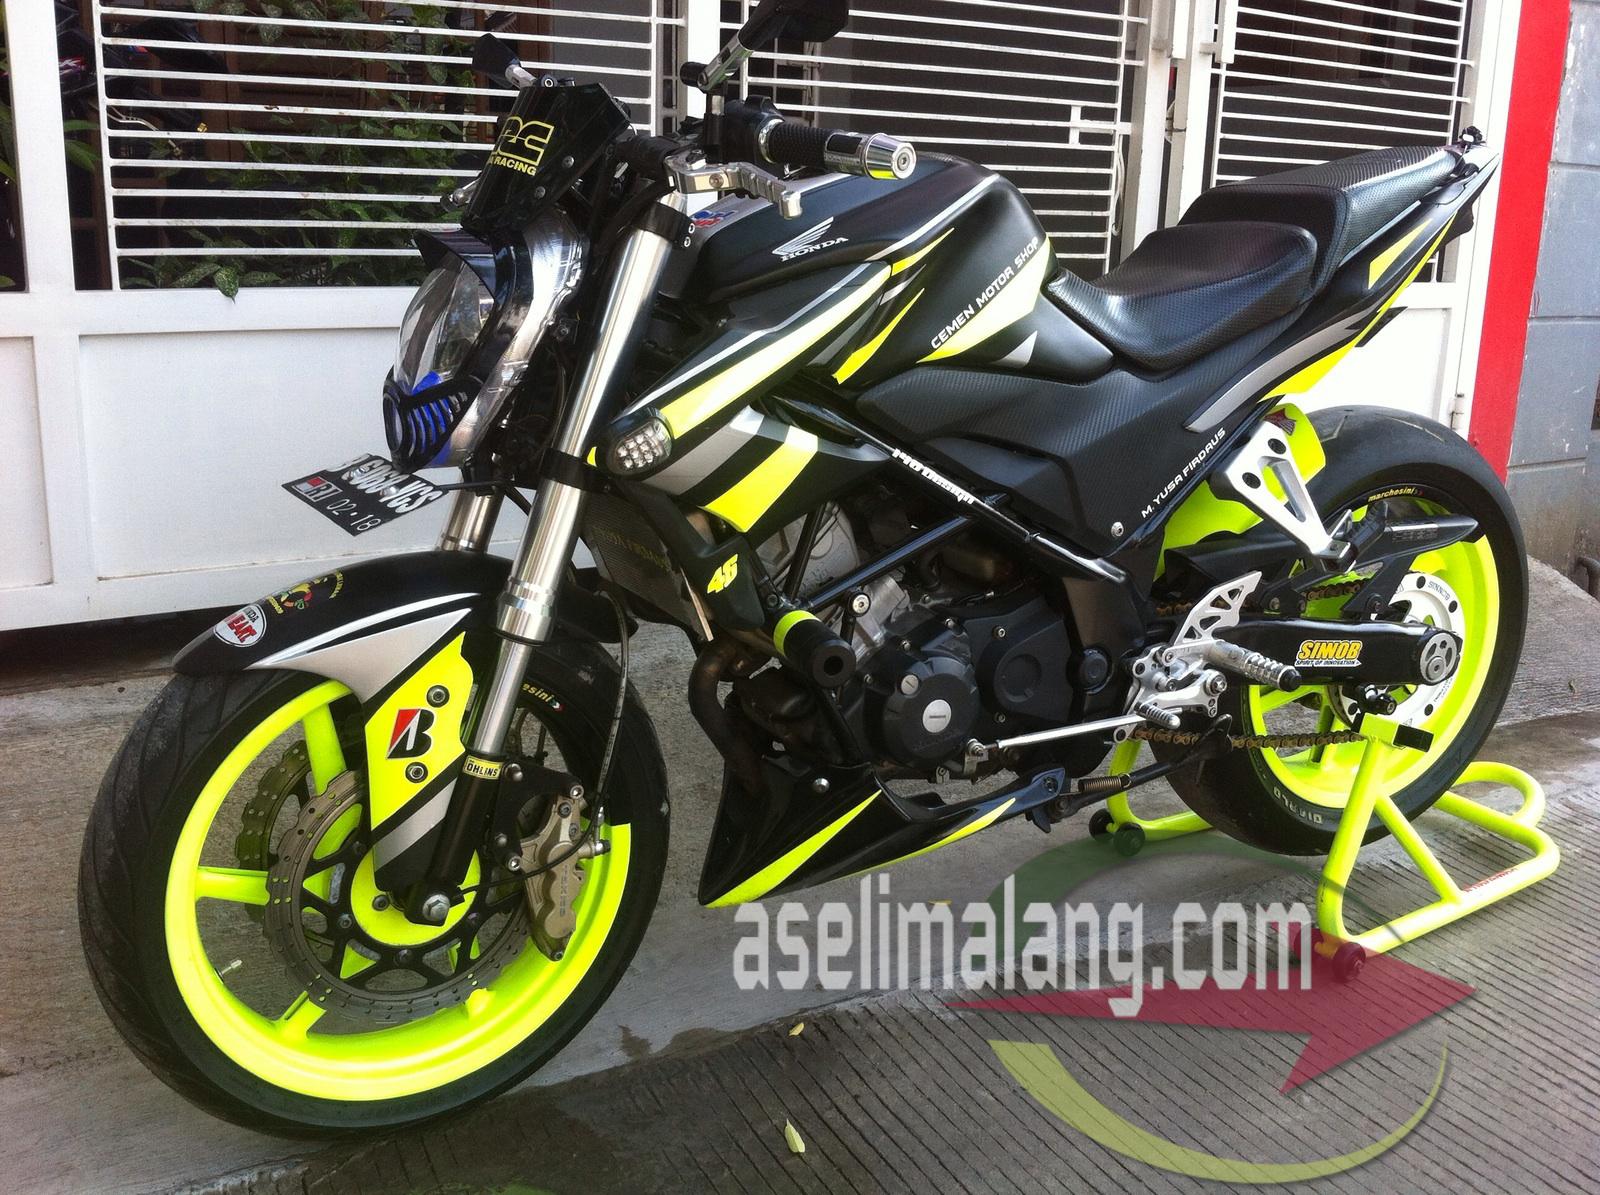 108 Modifikasi Motor Cb 150 R Warna Hitam Modifikasi Motor Honda